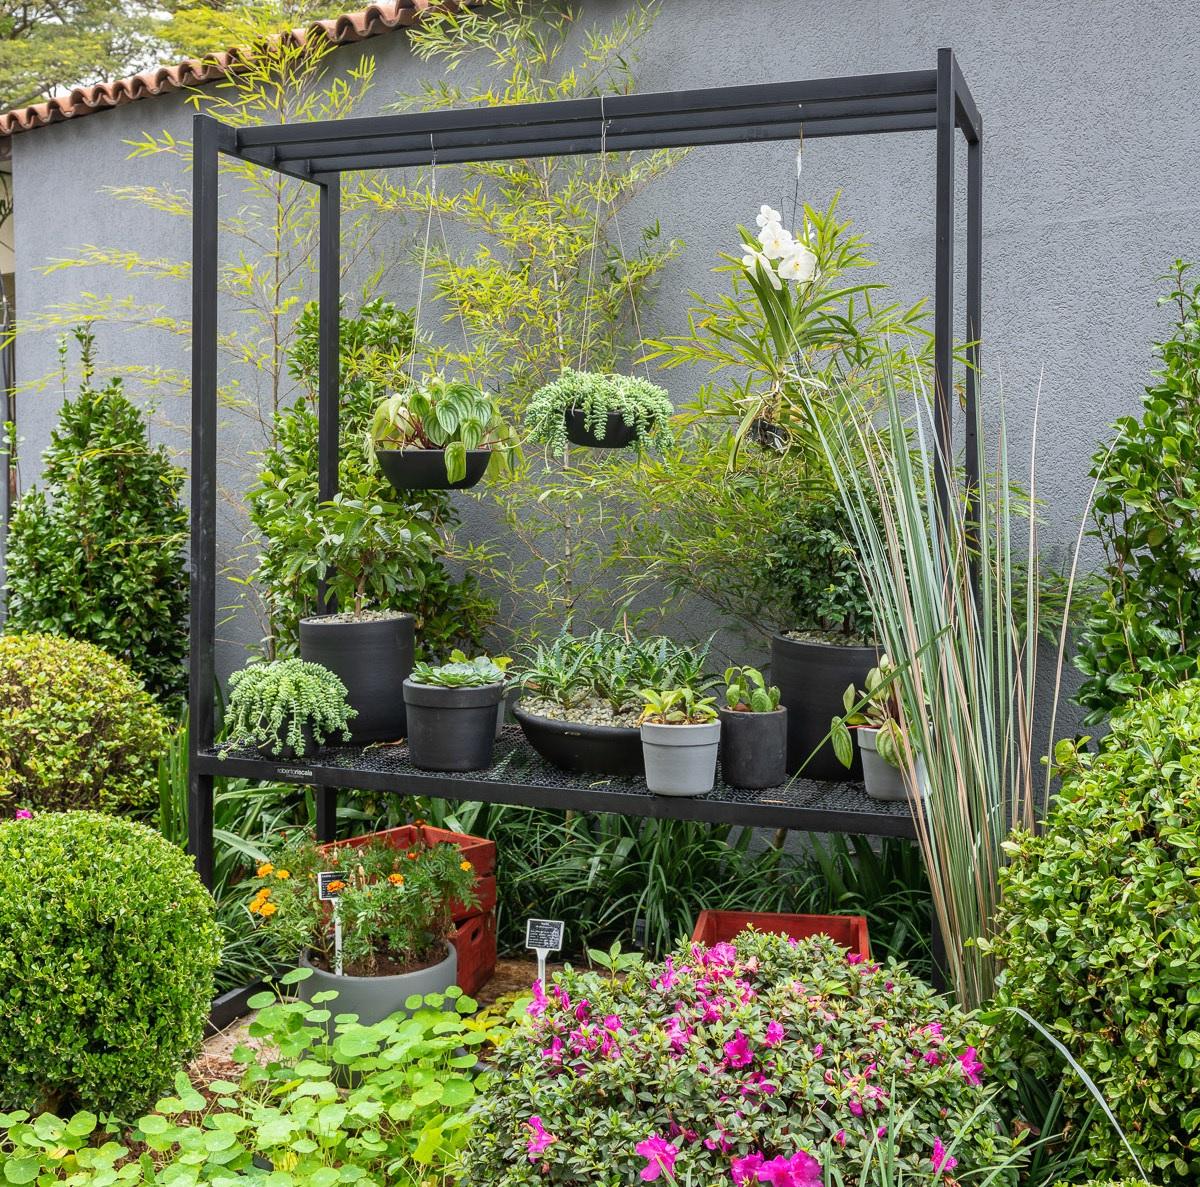 Jardins com vasos - Roberto Riscala - CASACOR